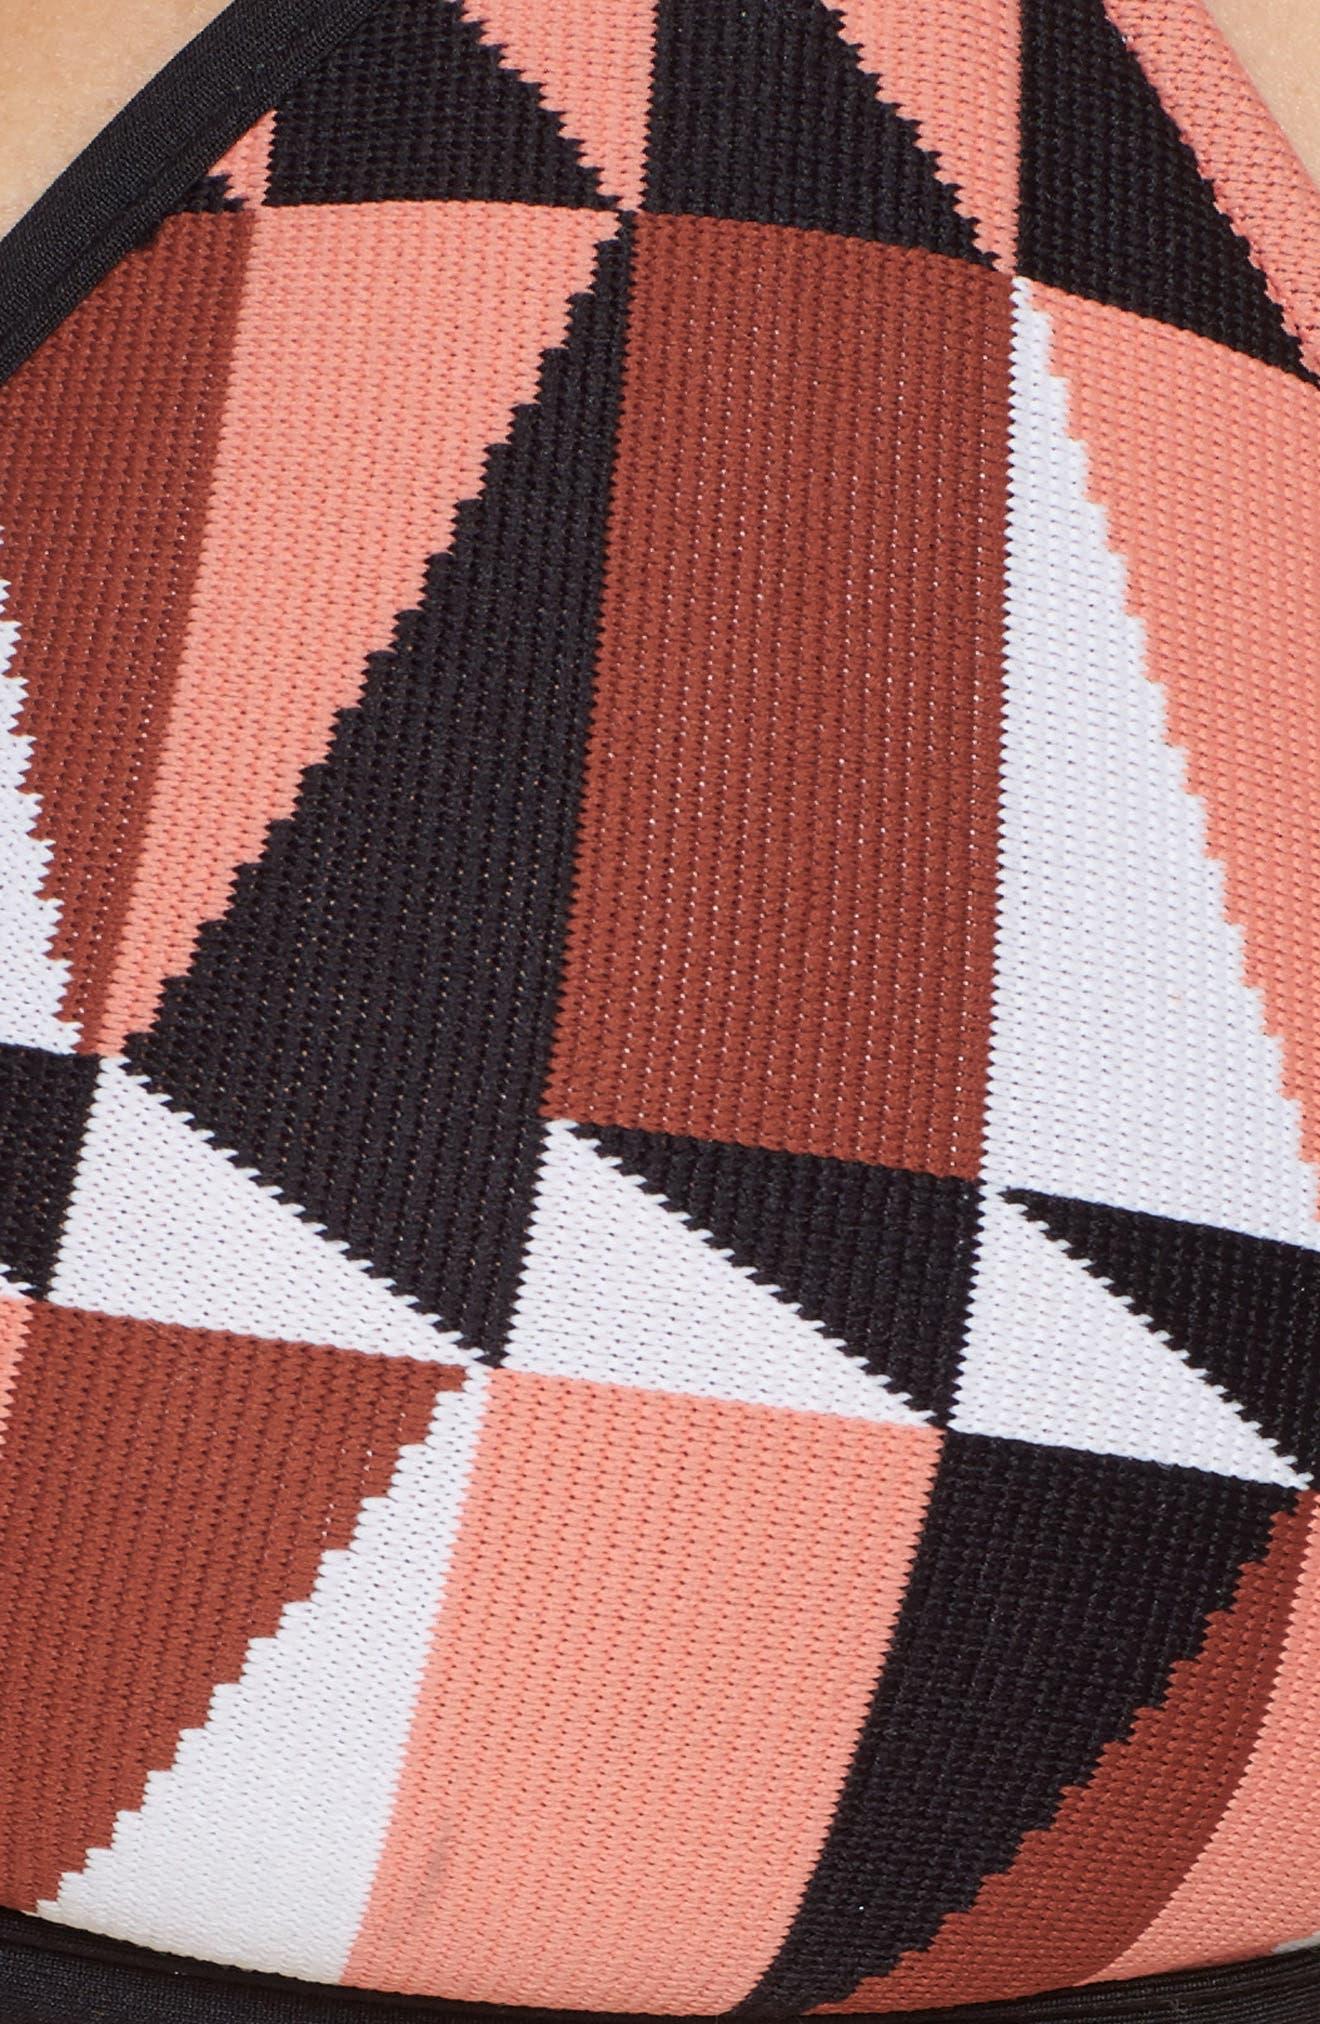 Jagged Geo Action Back Triangle Bikini Top,                             Alternate thumbnail 8, color,                             Burnt Amber